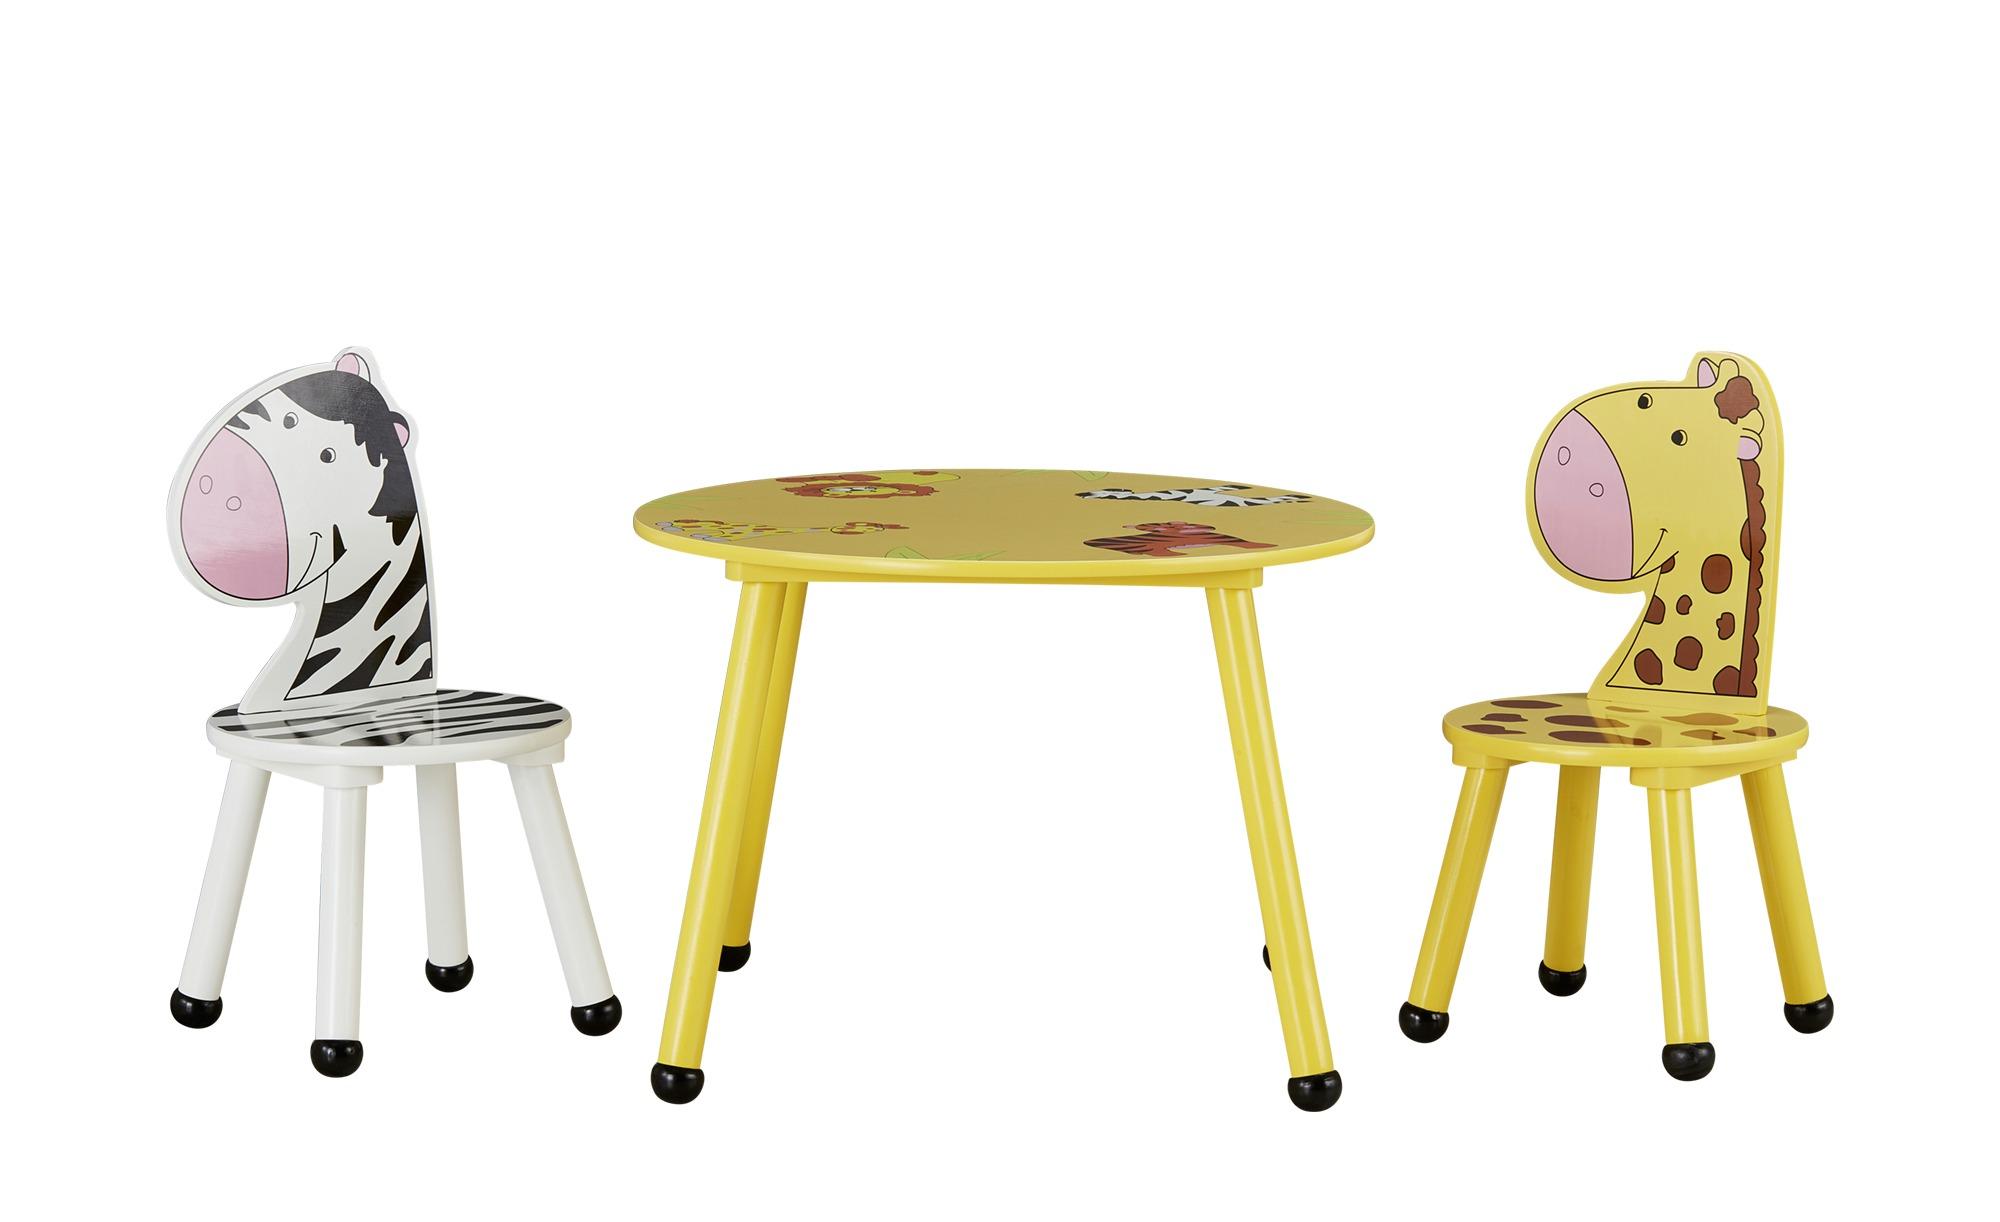 Kindersitzgruppe 'Savanna' mit Stuhllehnen in Tierform